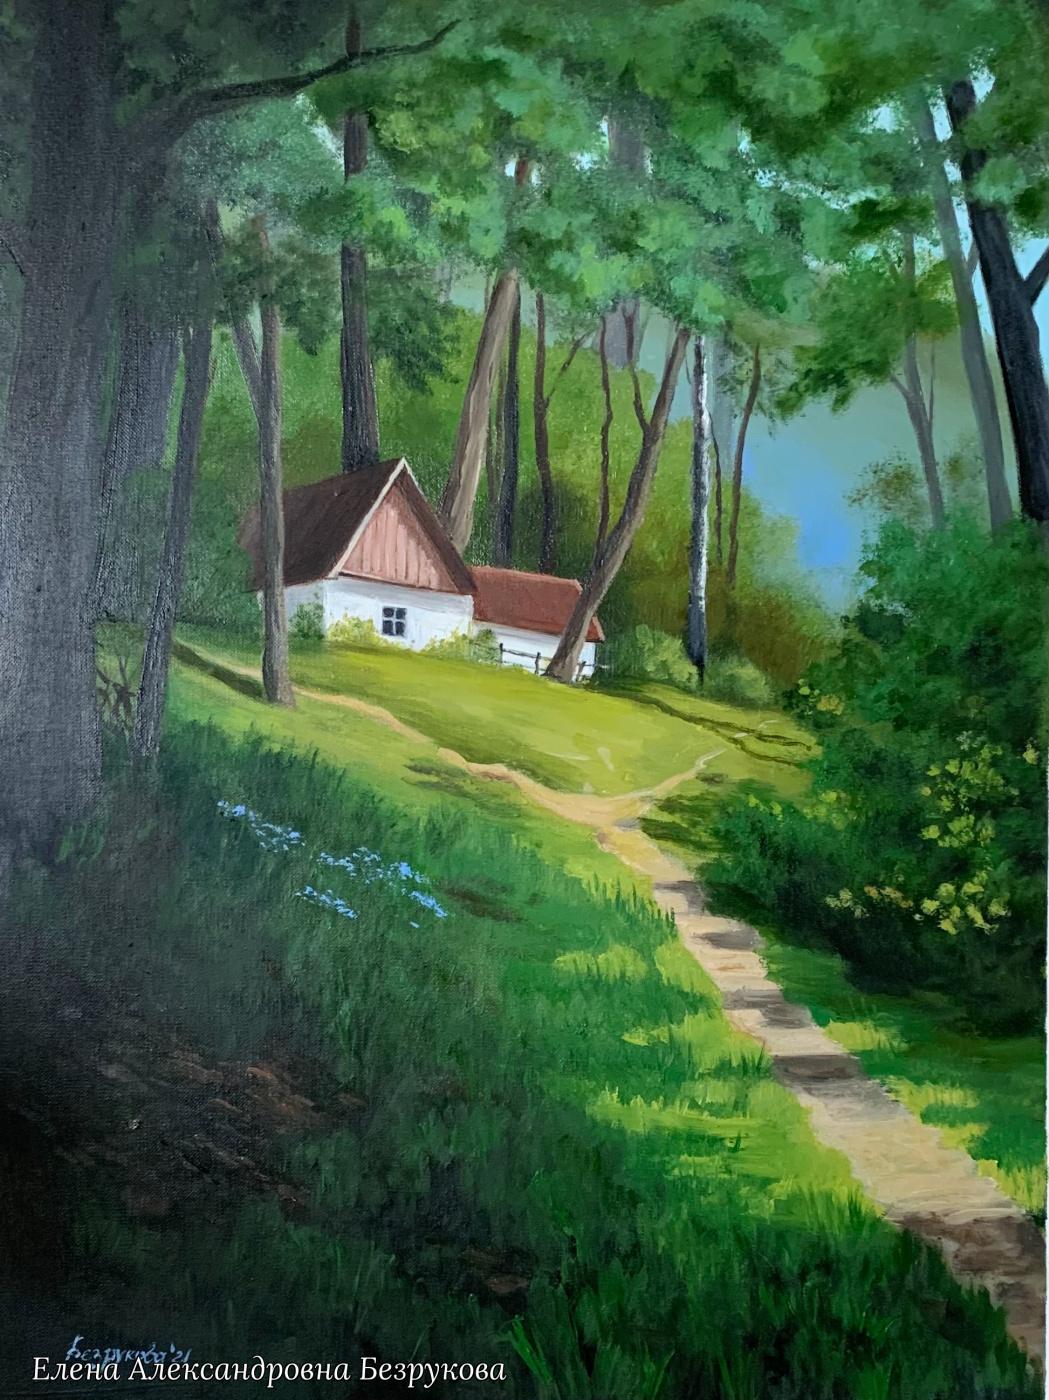 Елена Безрукова. Домик в лесу